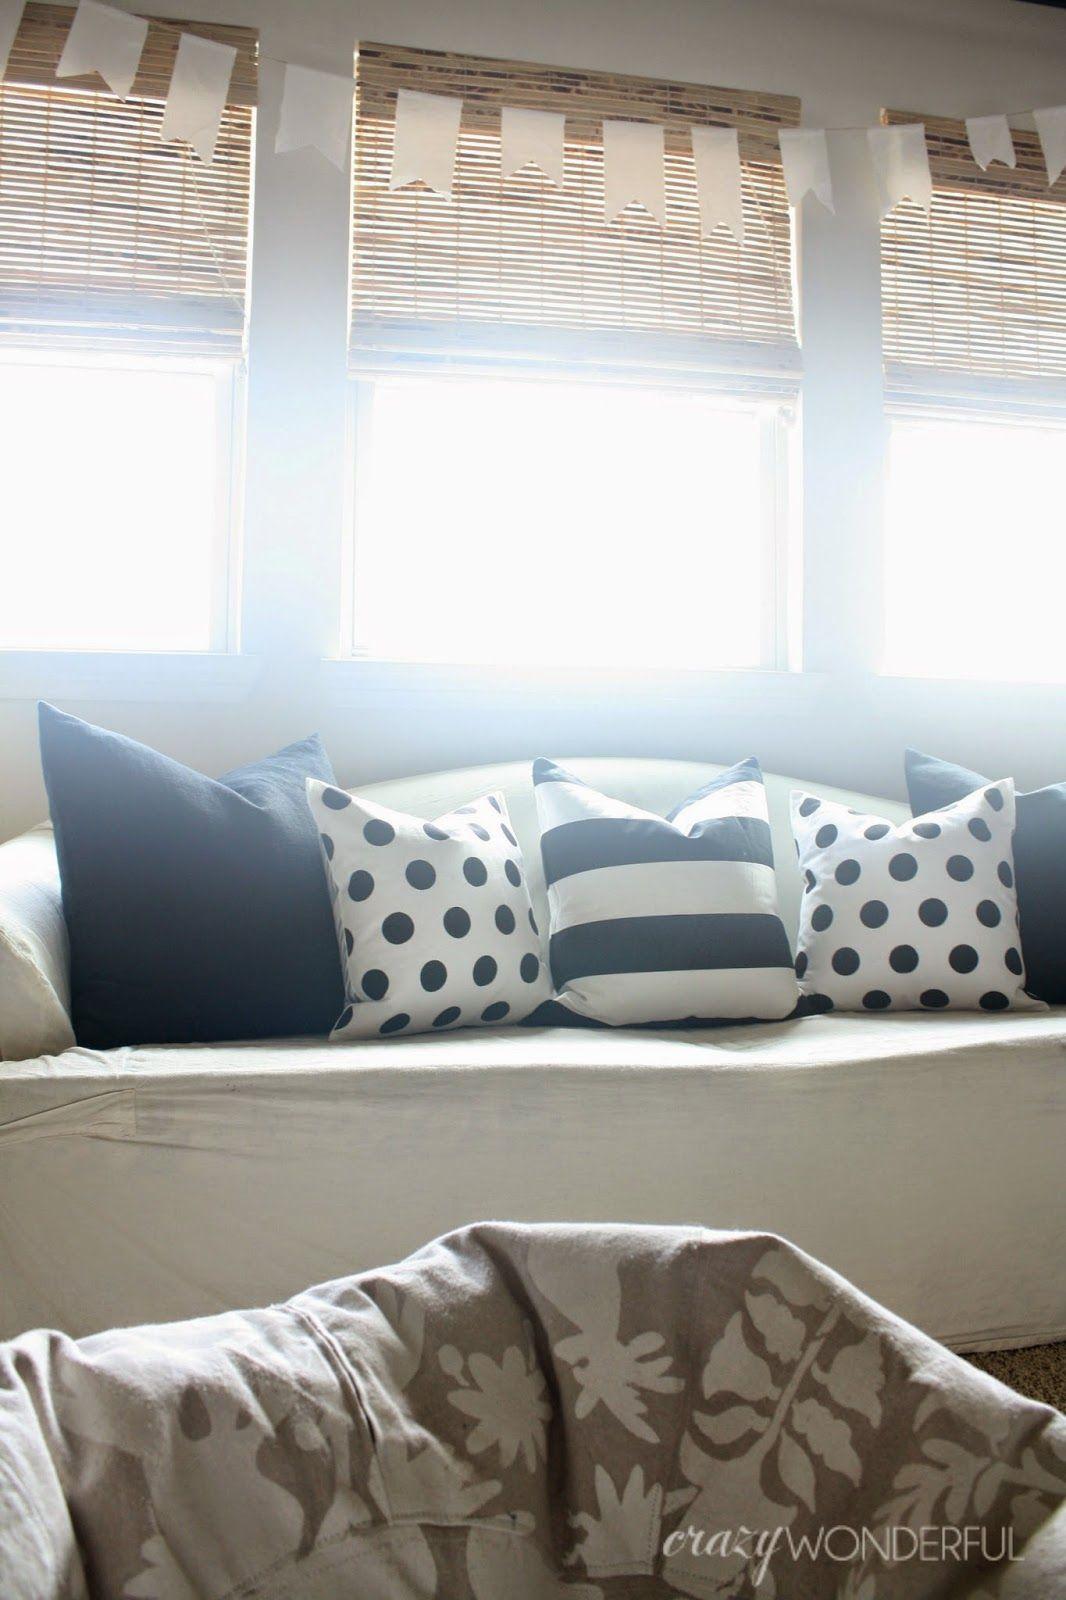 Pin On Crazy Wonderful Blog Playroom progress curtains pillow